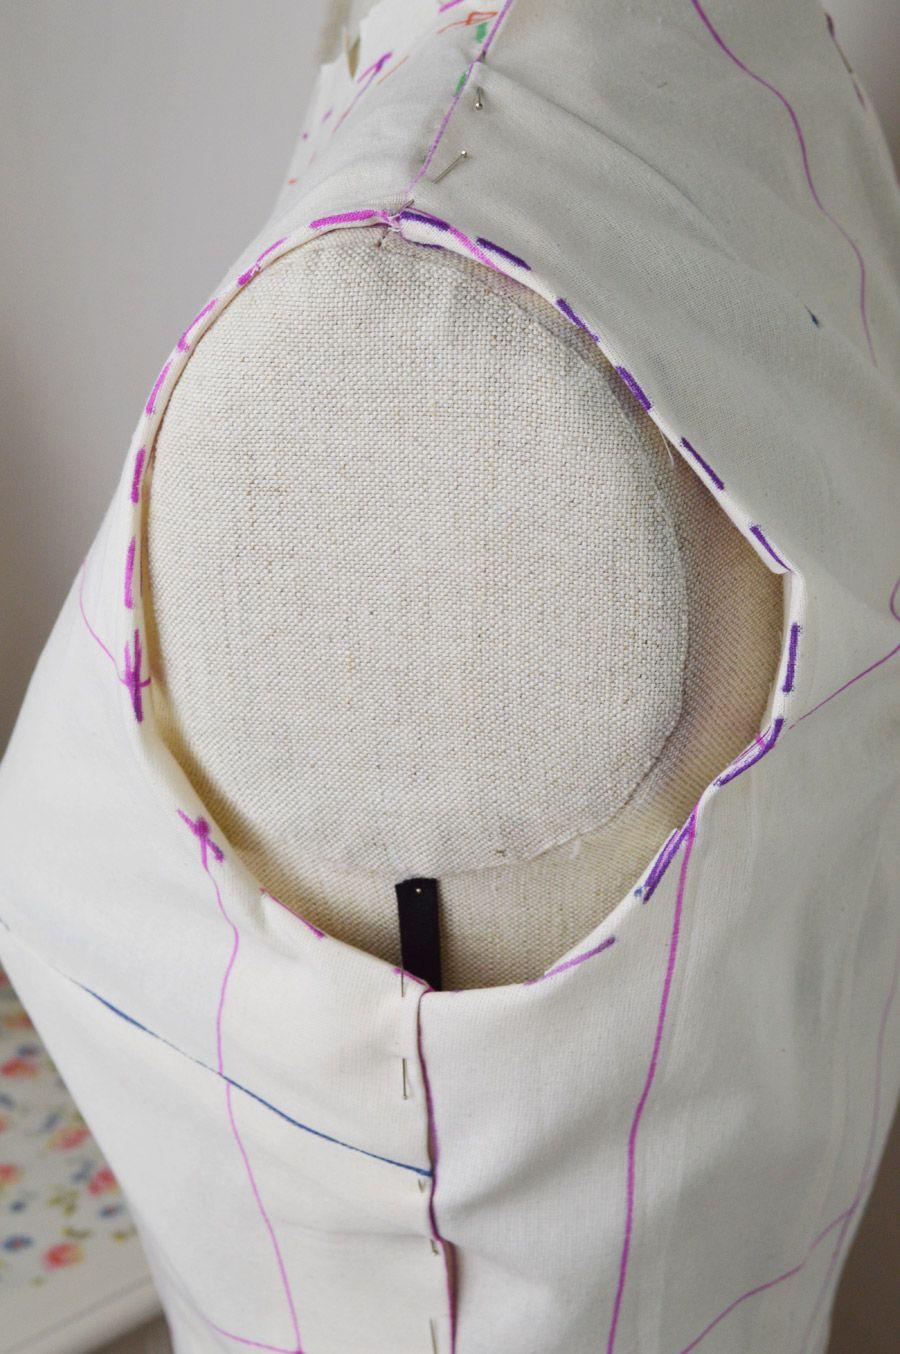 Armscye fun with fitting | sew must do | Pinterest | Costura ...